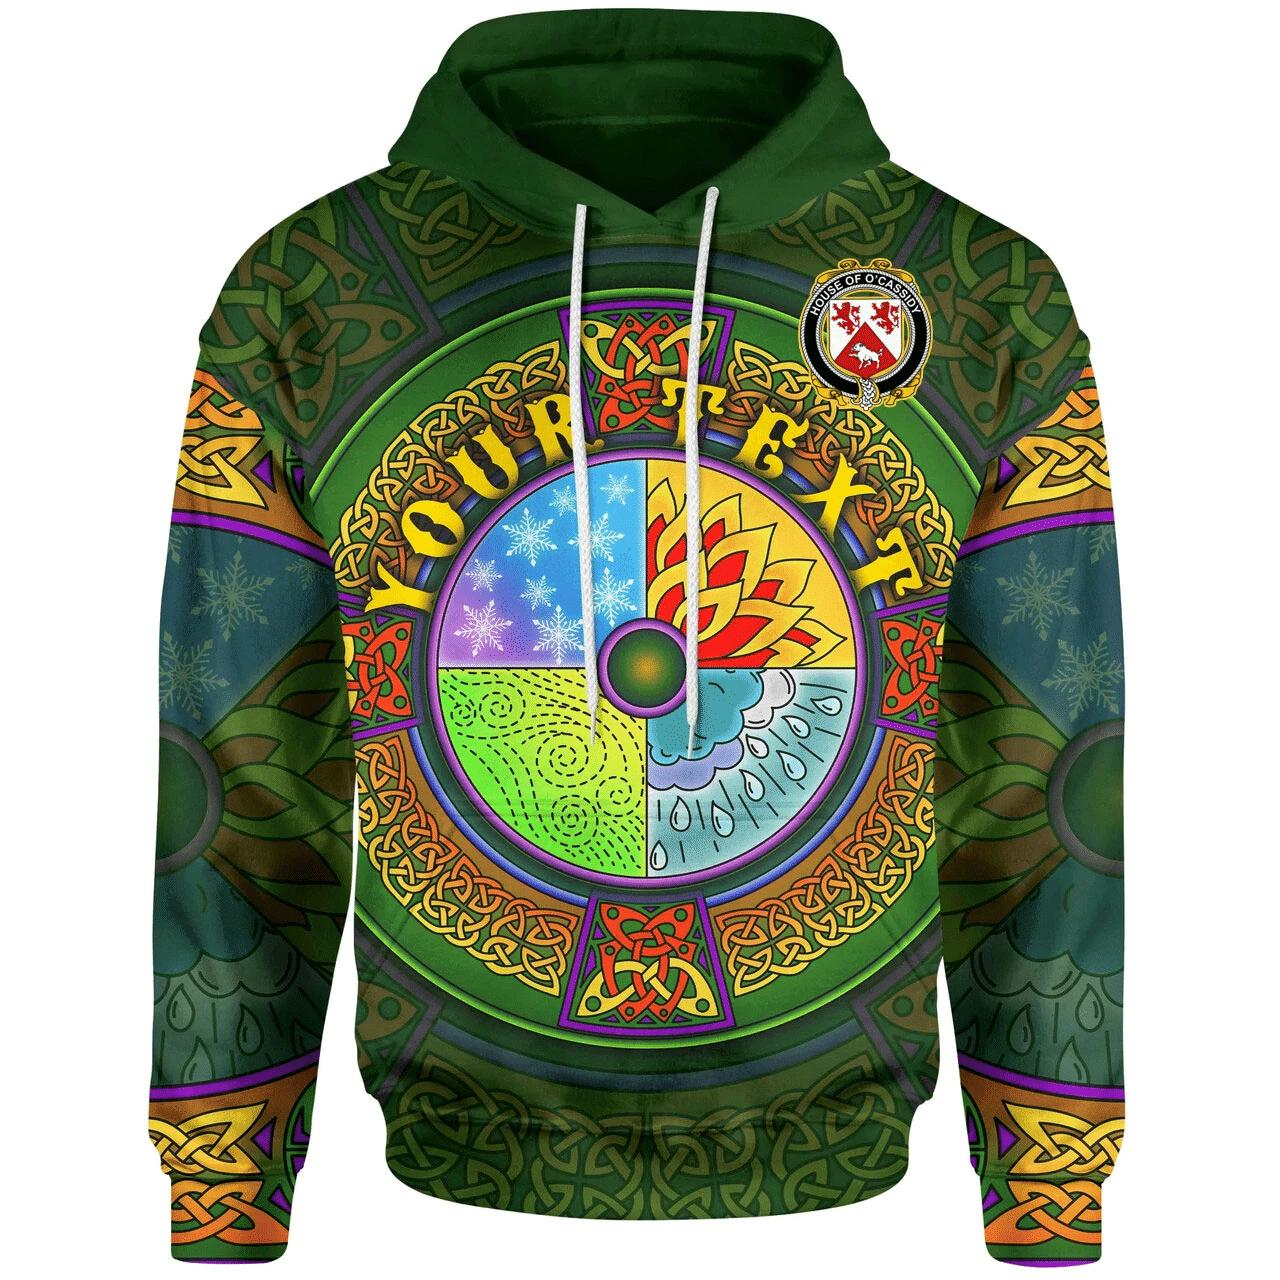 (Custom) 1stIreland Ireland Hoodie - House of O'CASSIDY Irish Family Crest Hoodie - Celtic Elements A7